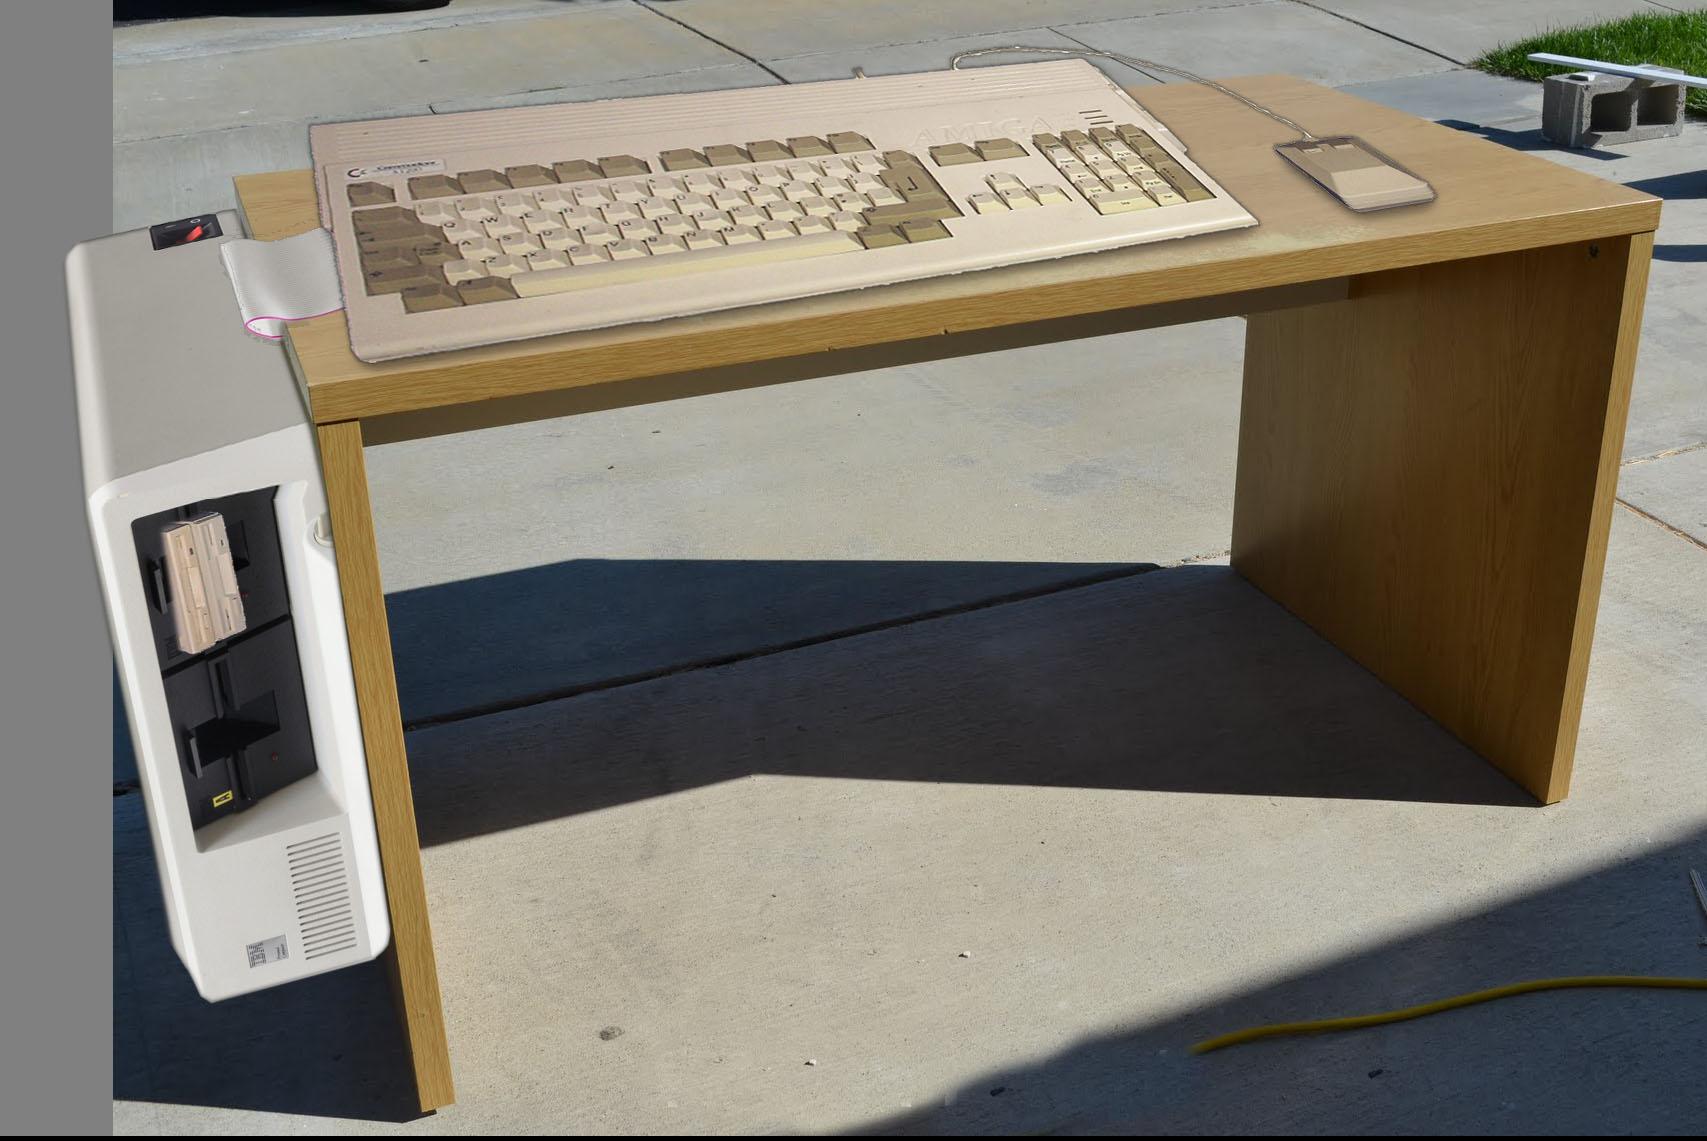 So I got an Amiga - Blog - Level1Techs Forums